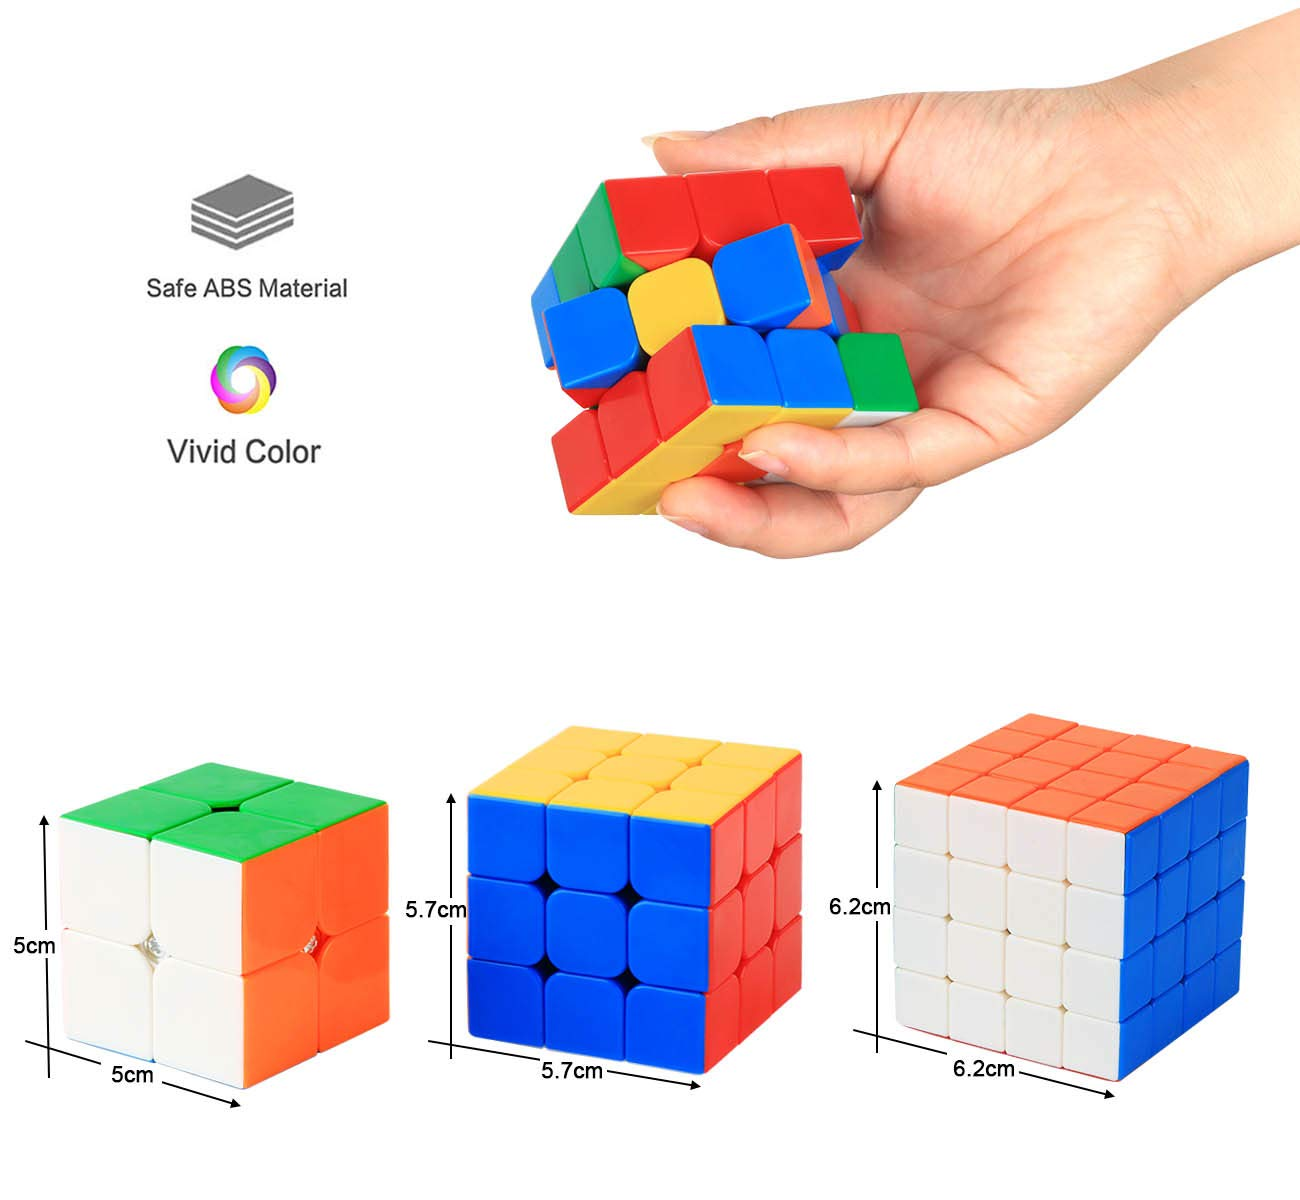 CKClink Zauberw/ürfel Set,Speed Cube Set 2x2x2 3x3x3 4x4x4 Magic Cube Magic Cube Puzzle Spielw/ürfel f/ür Anf/änger